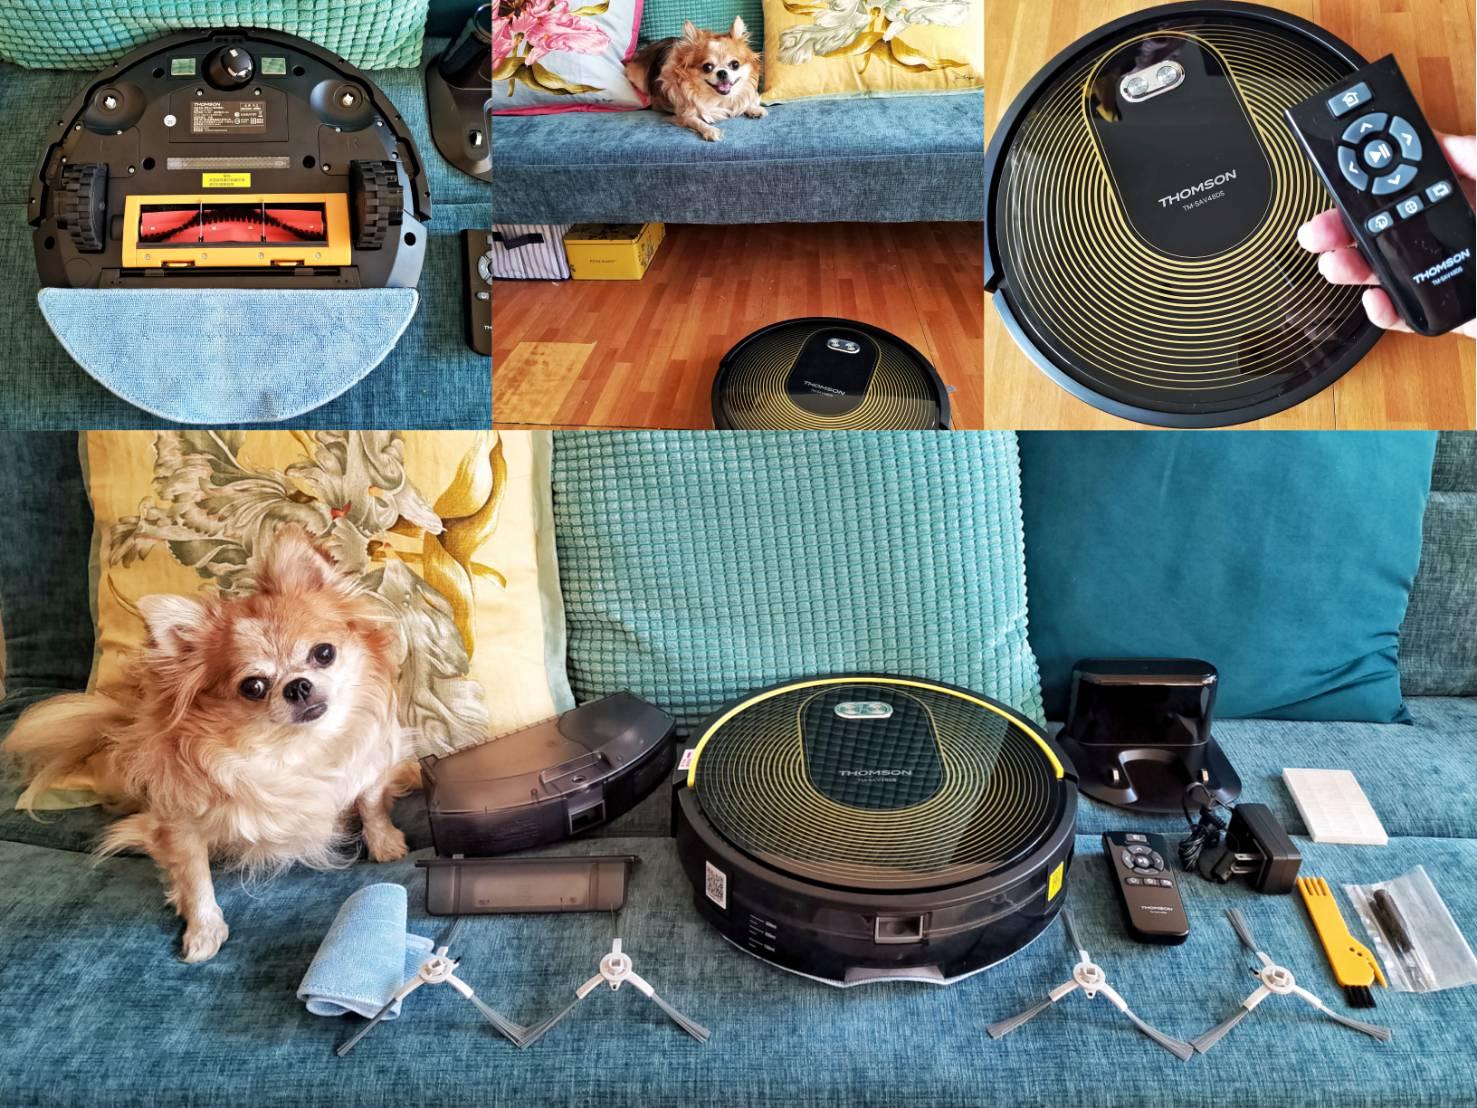 THOMSON智能WIFI掃地機器人開箱 紫外線殺菌+掃吸擦拖+吸力強+低噪音 98%全屋高覆蓋清掃 吃貨旅遊作家水靜葳